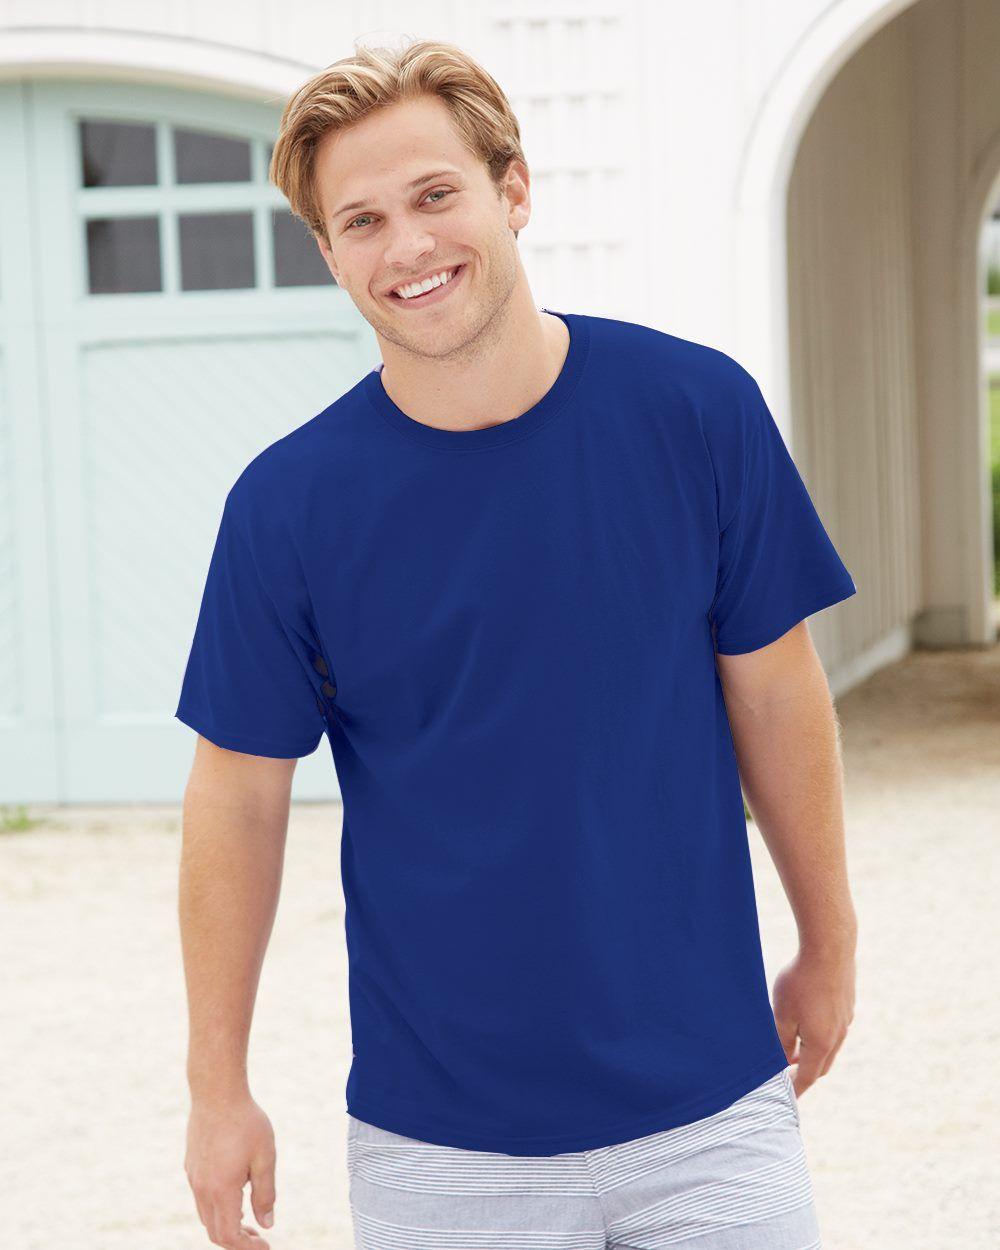 Hanes 5280 100% Comfort Soft Cotton T Shirt Shop now: http://bit.ly/1jkXJdb